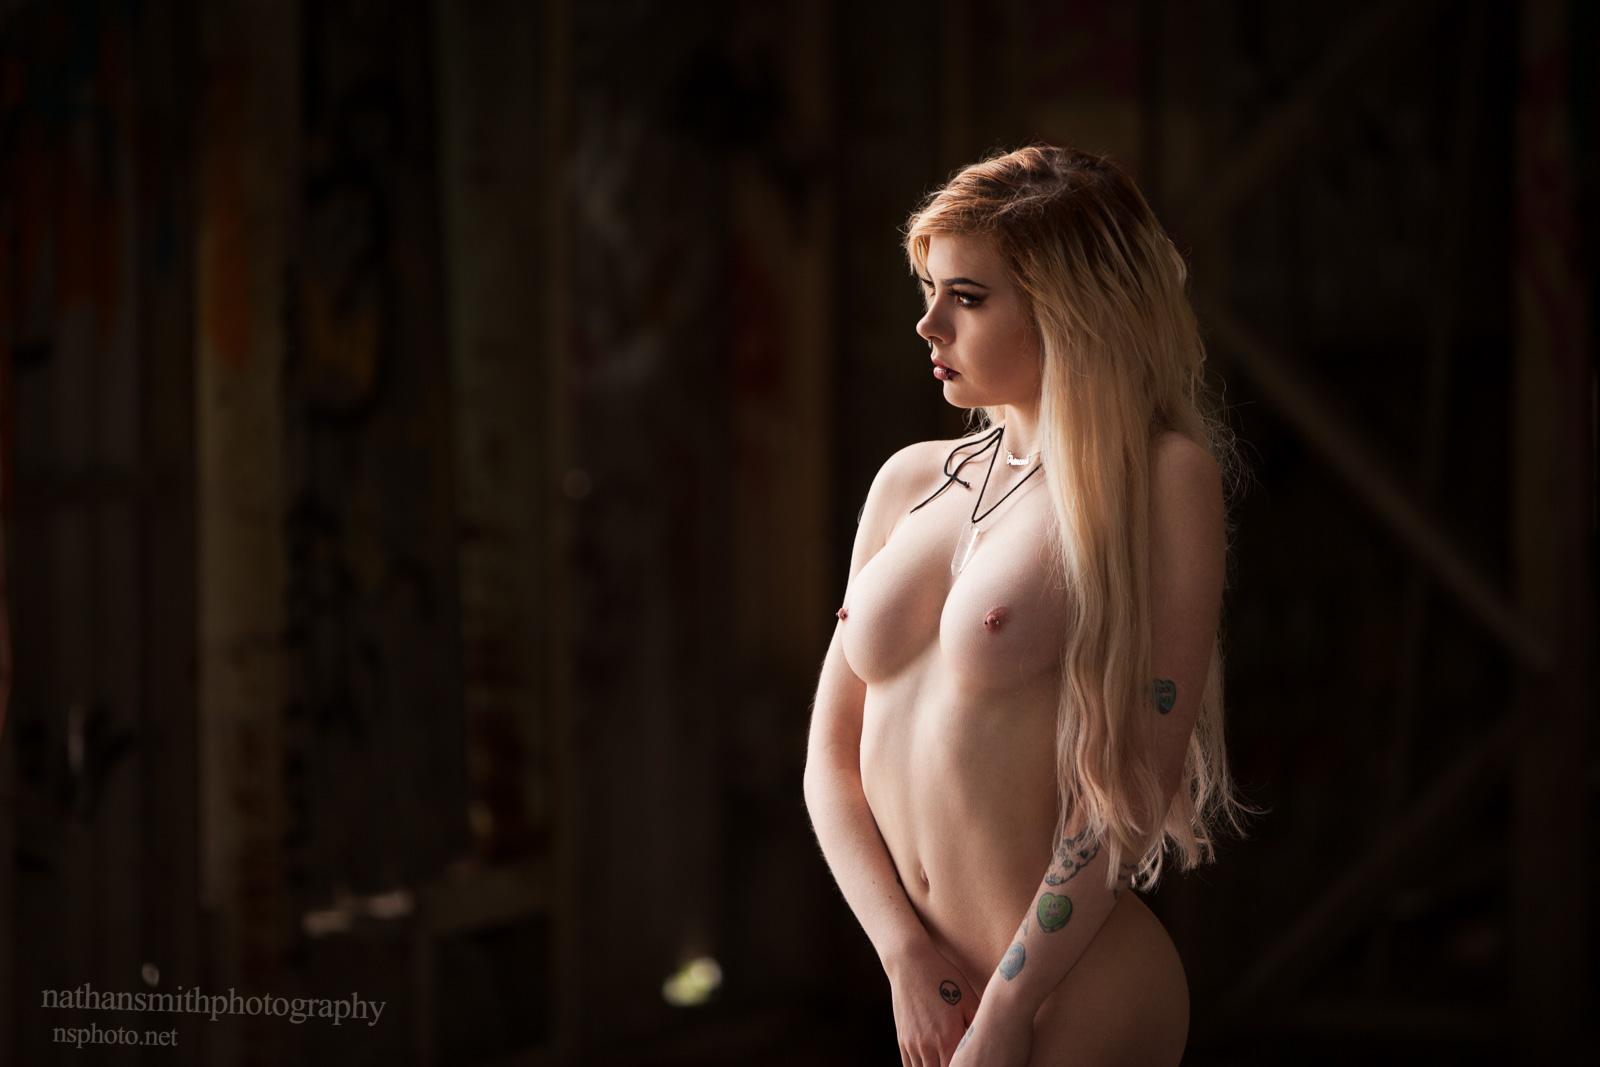 Adiland Porn Pics shaniah in adelaide - nathan smith photography